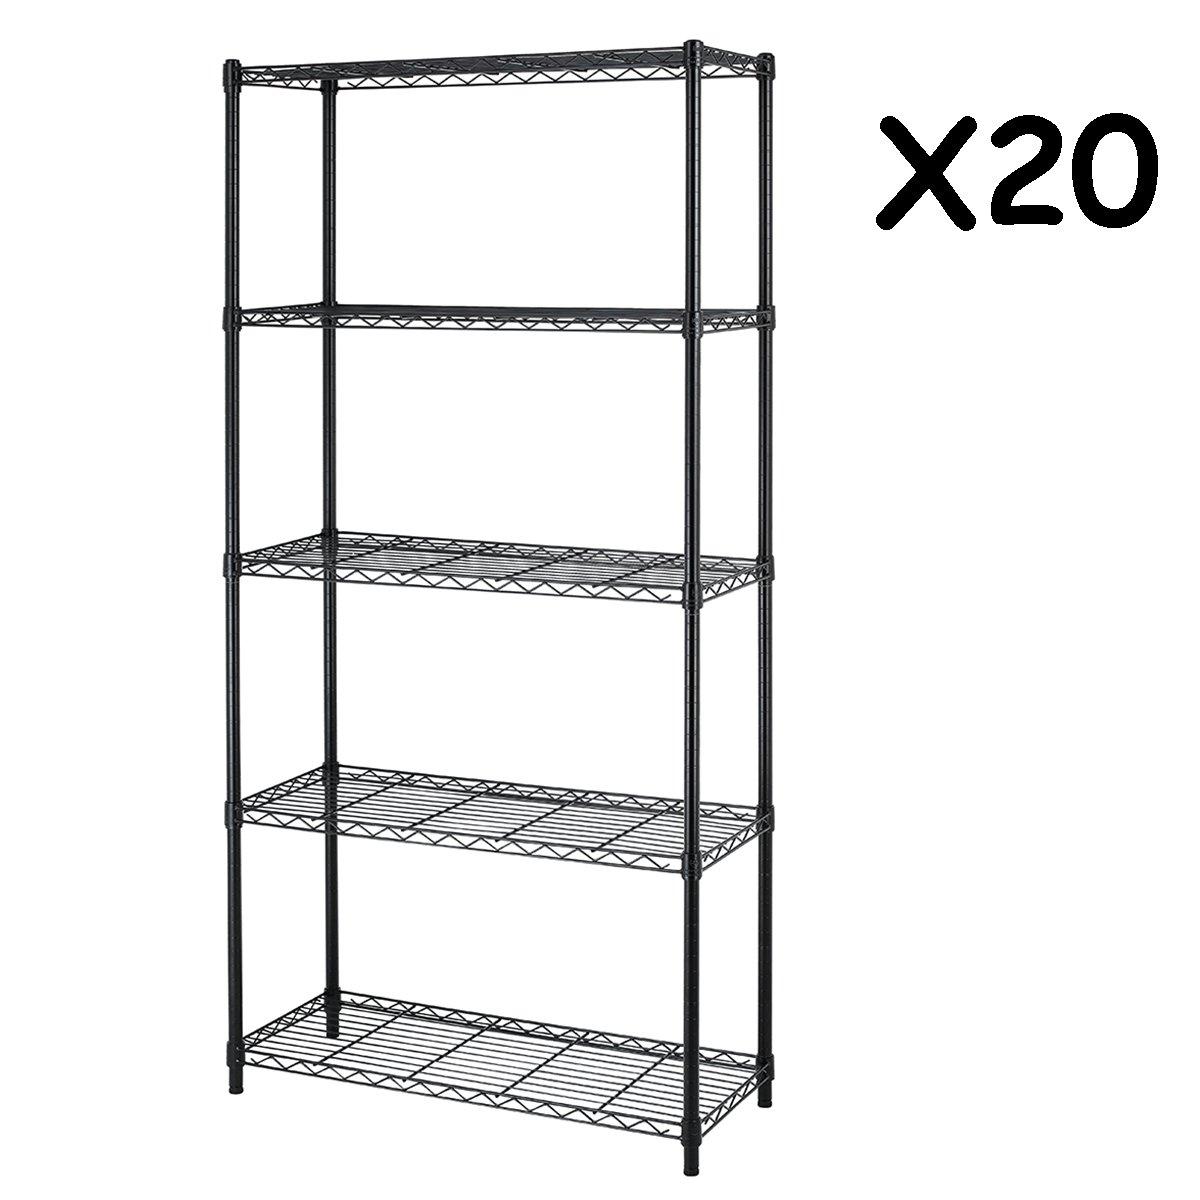 5-Shelf Steel Wire Tier Layer Shelving 72''x36''x14'' Storage Rack,Black,50 pcs